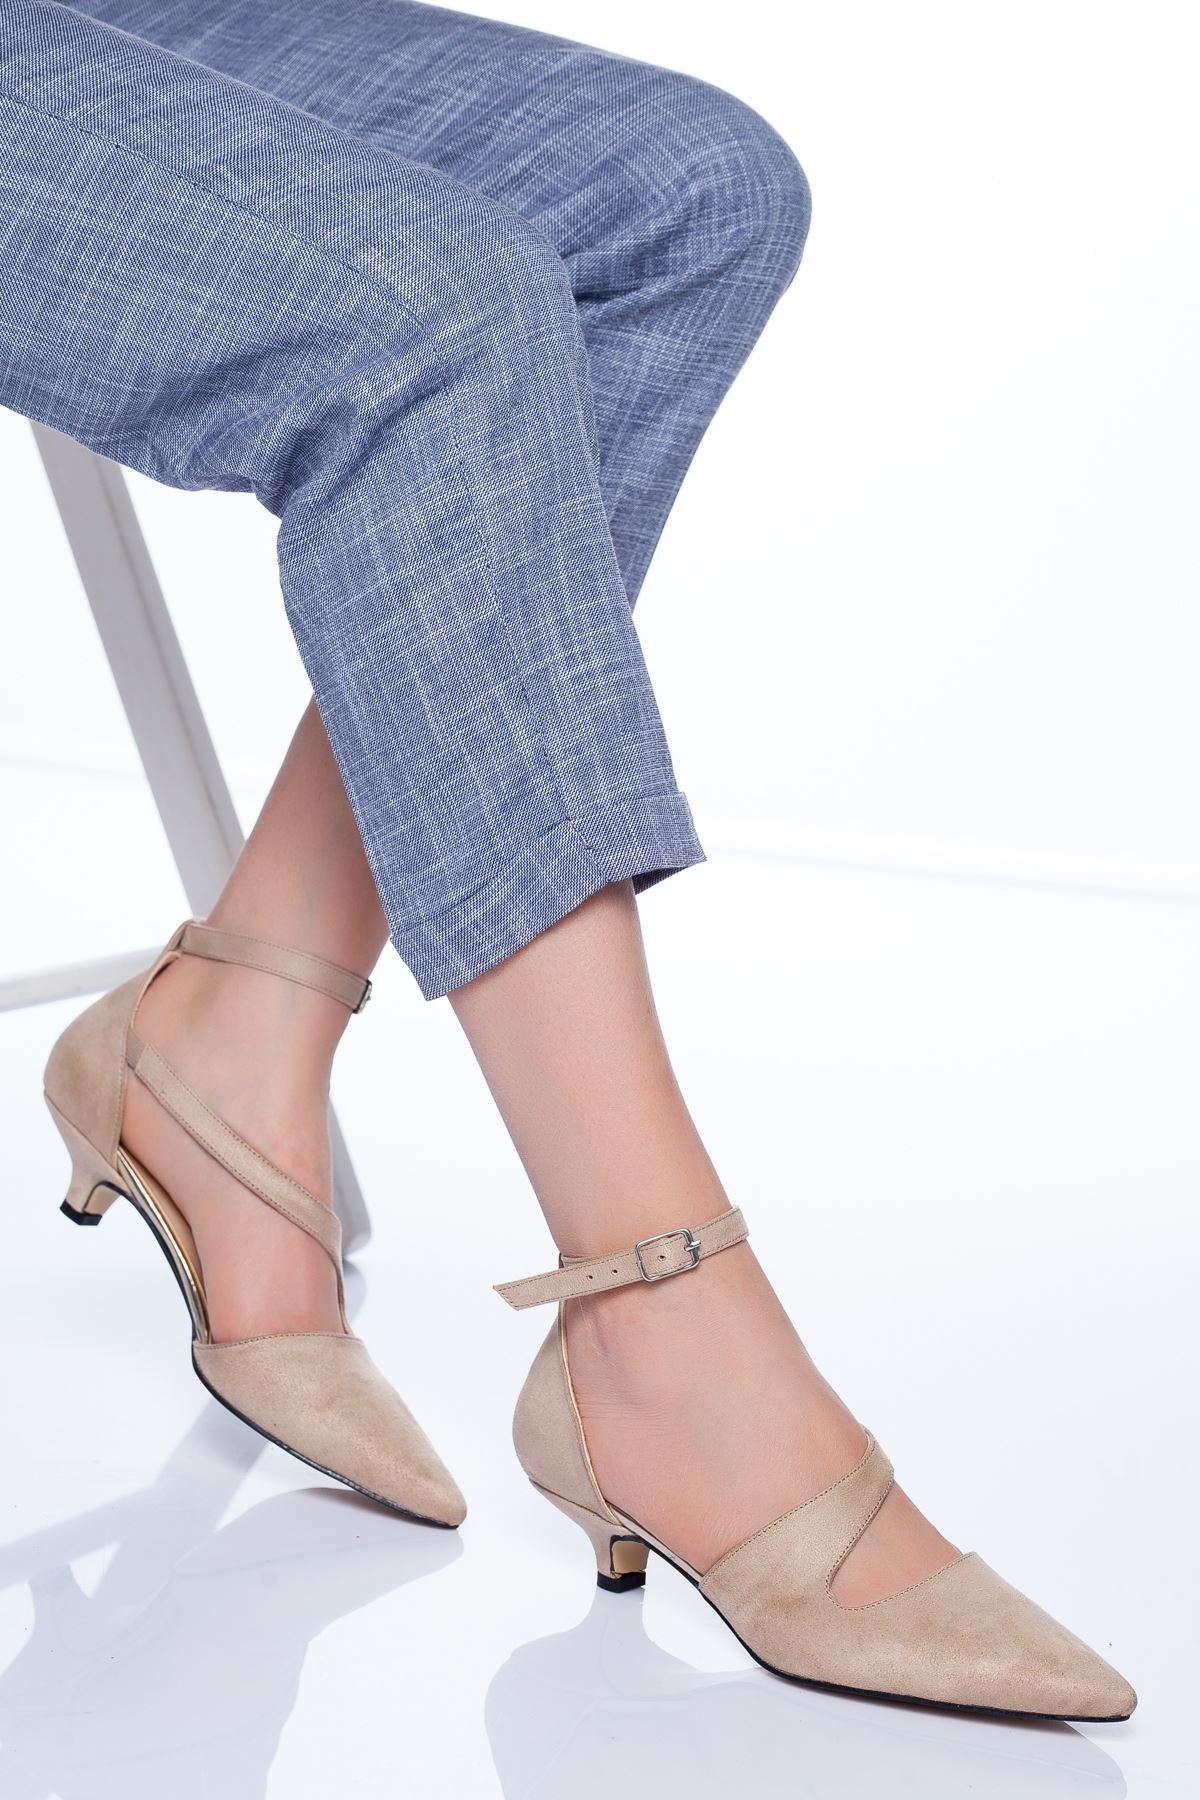 Costa Topuklu Ayakkabı TEN SÜET